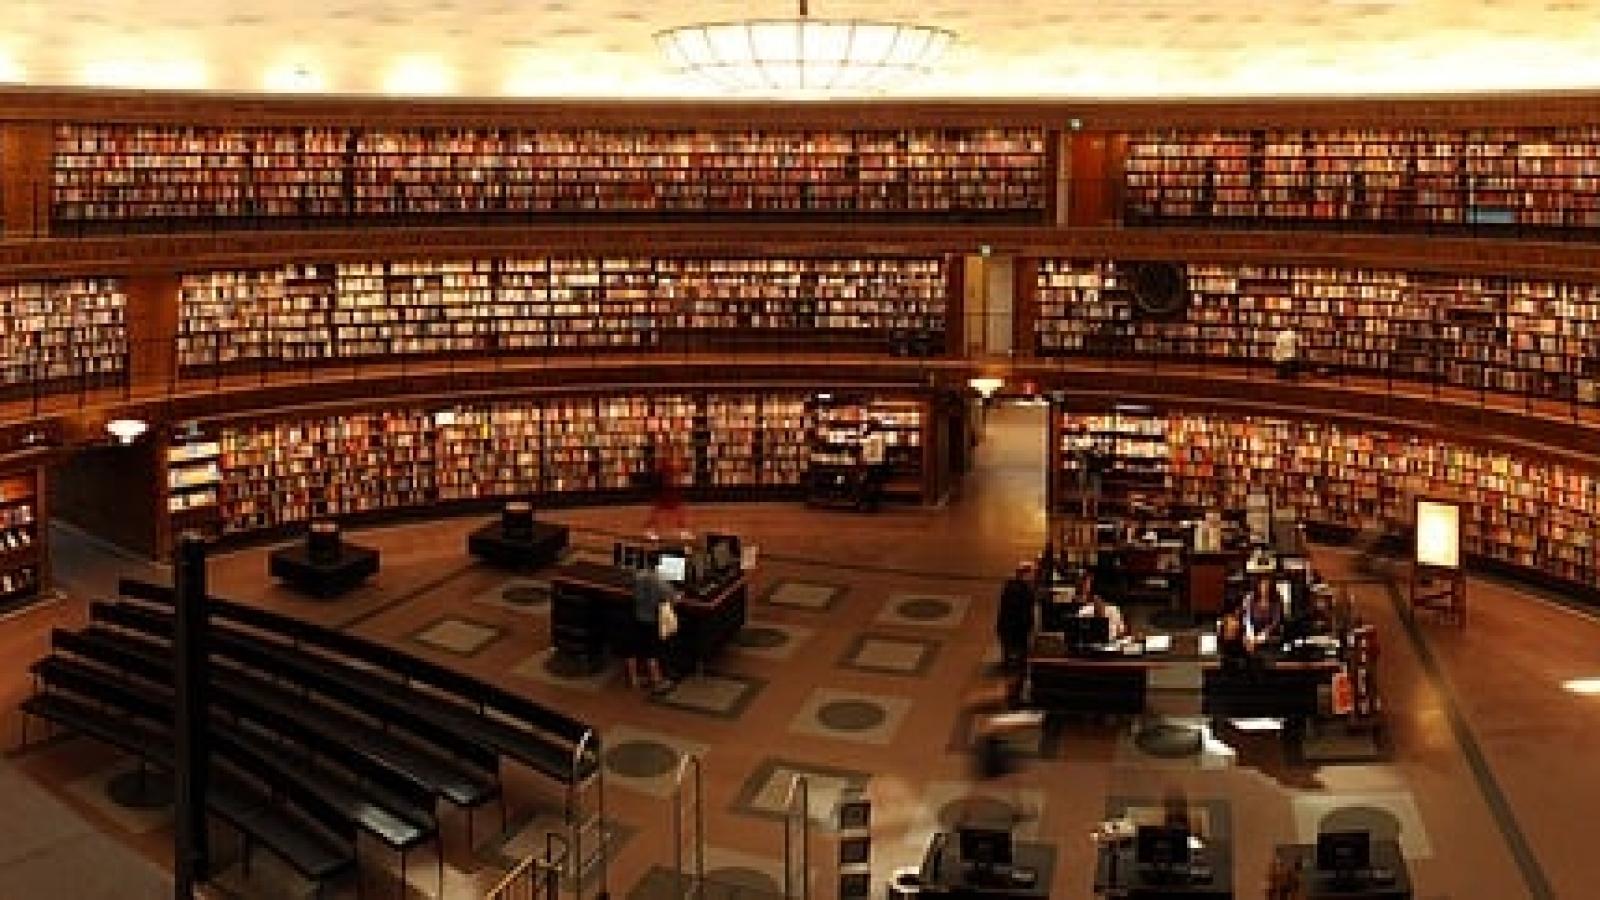 books-ge849b5ca5_640